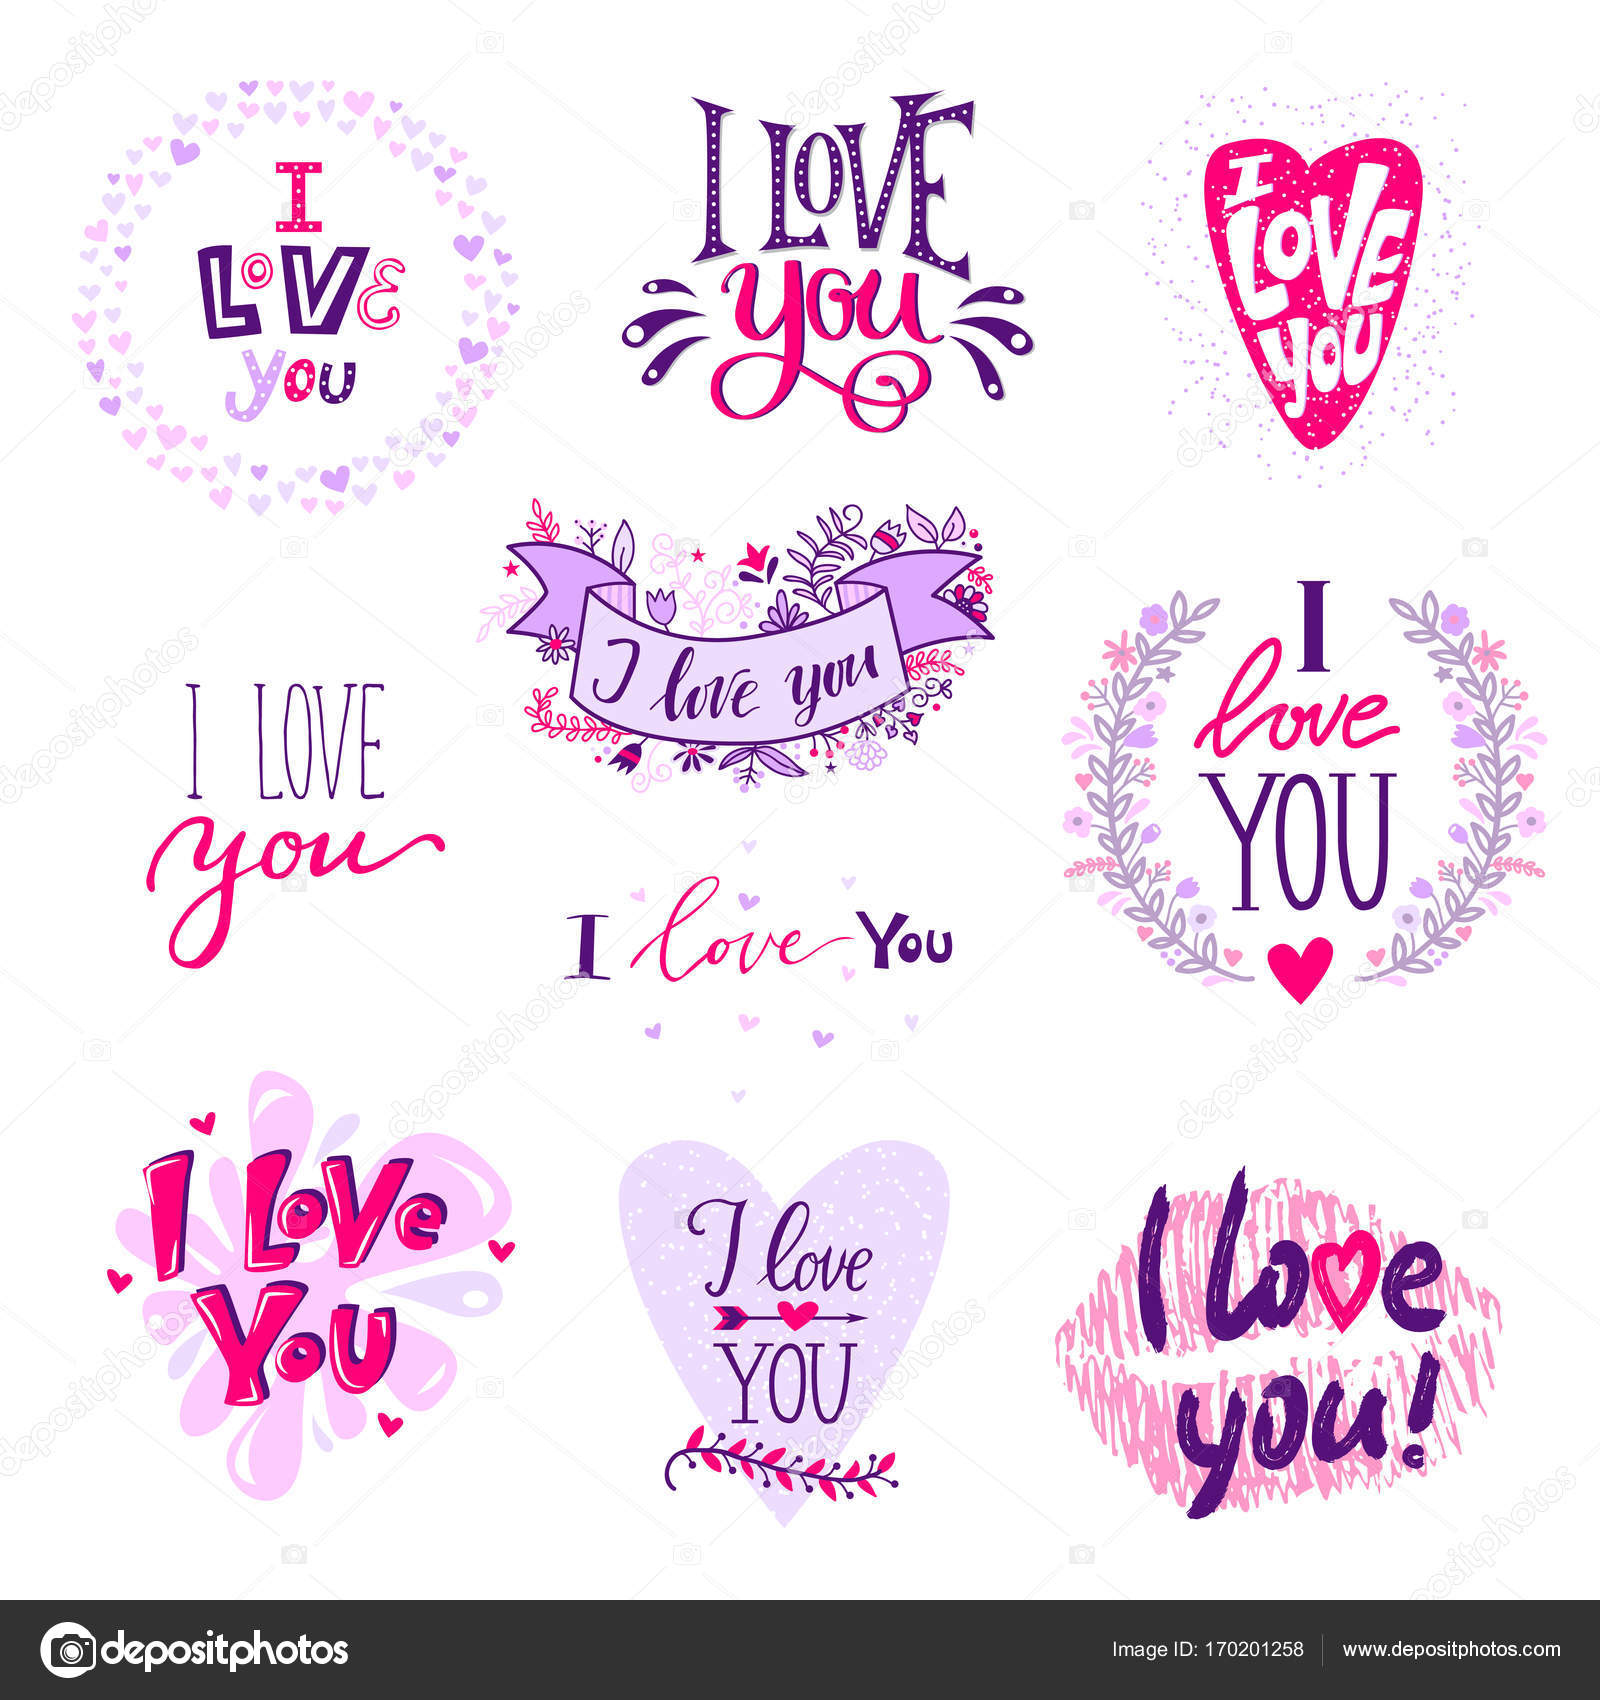 Eu Te Amo Caligrafia Texto Frases Dia Dos Namorados Ou Casamento